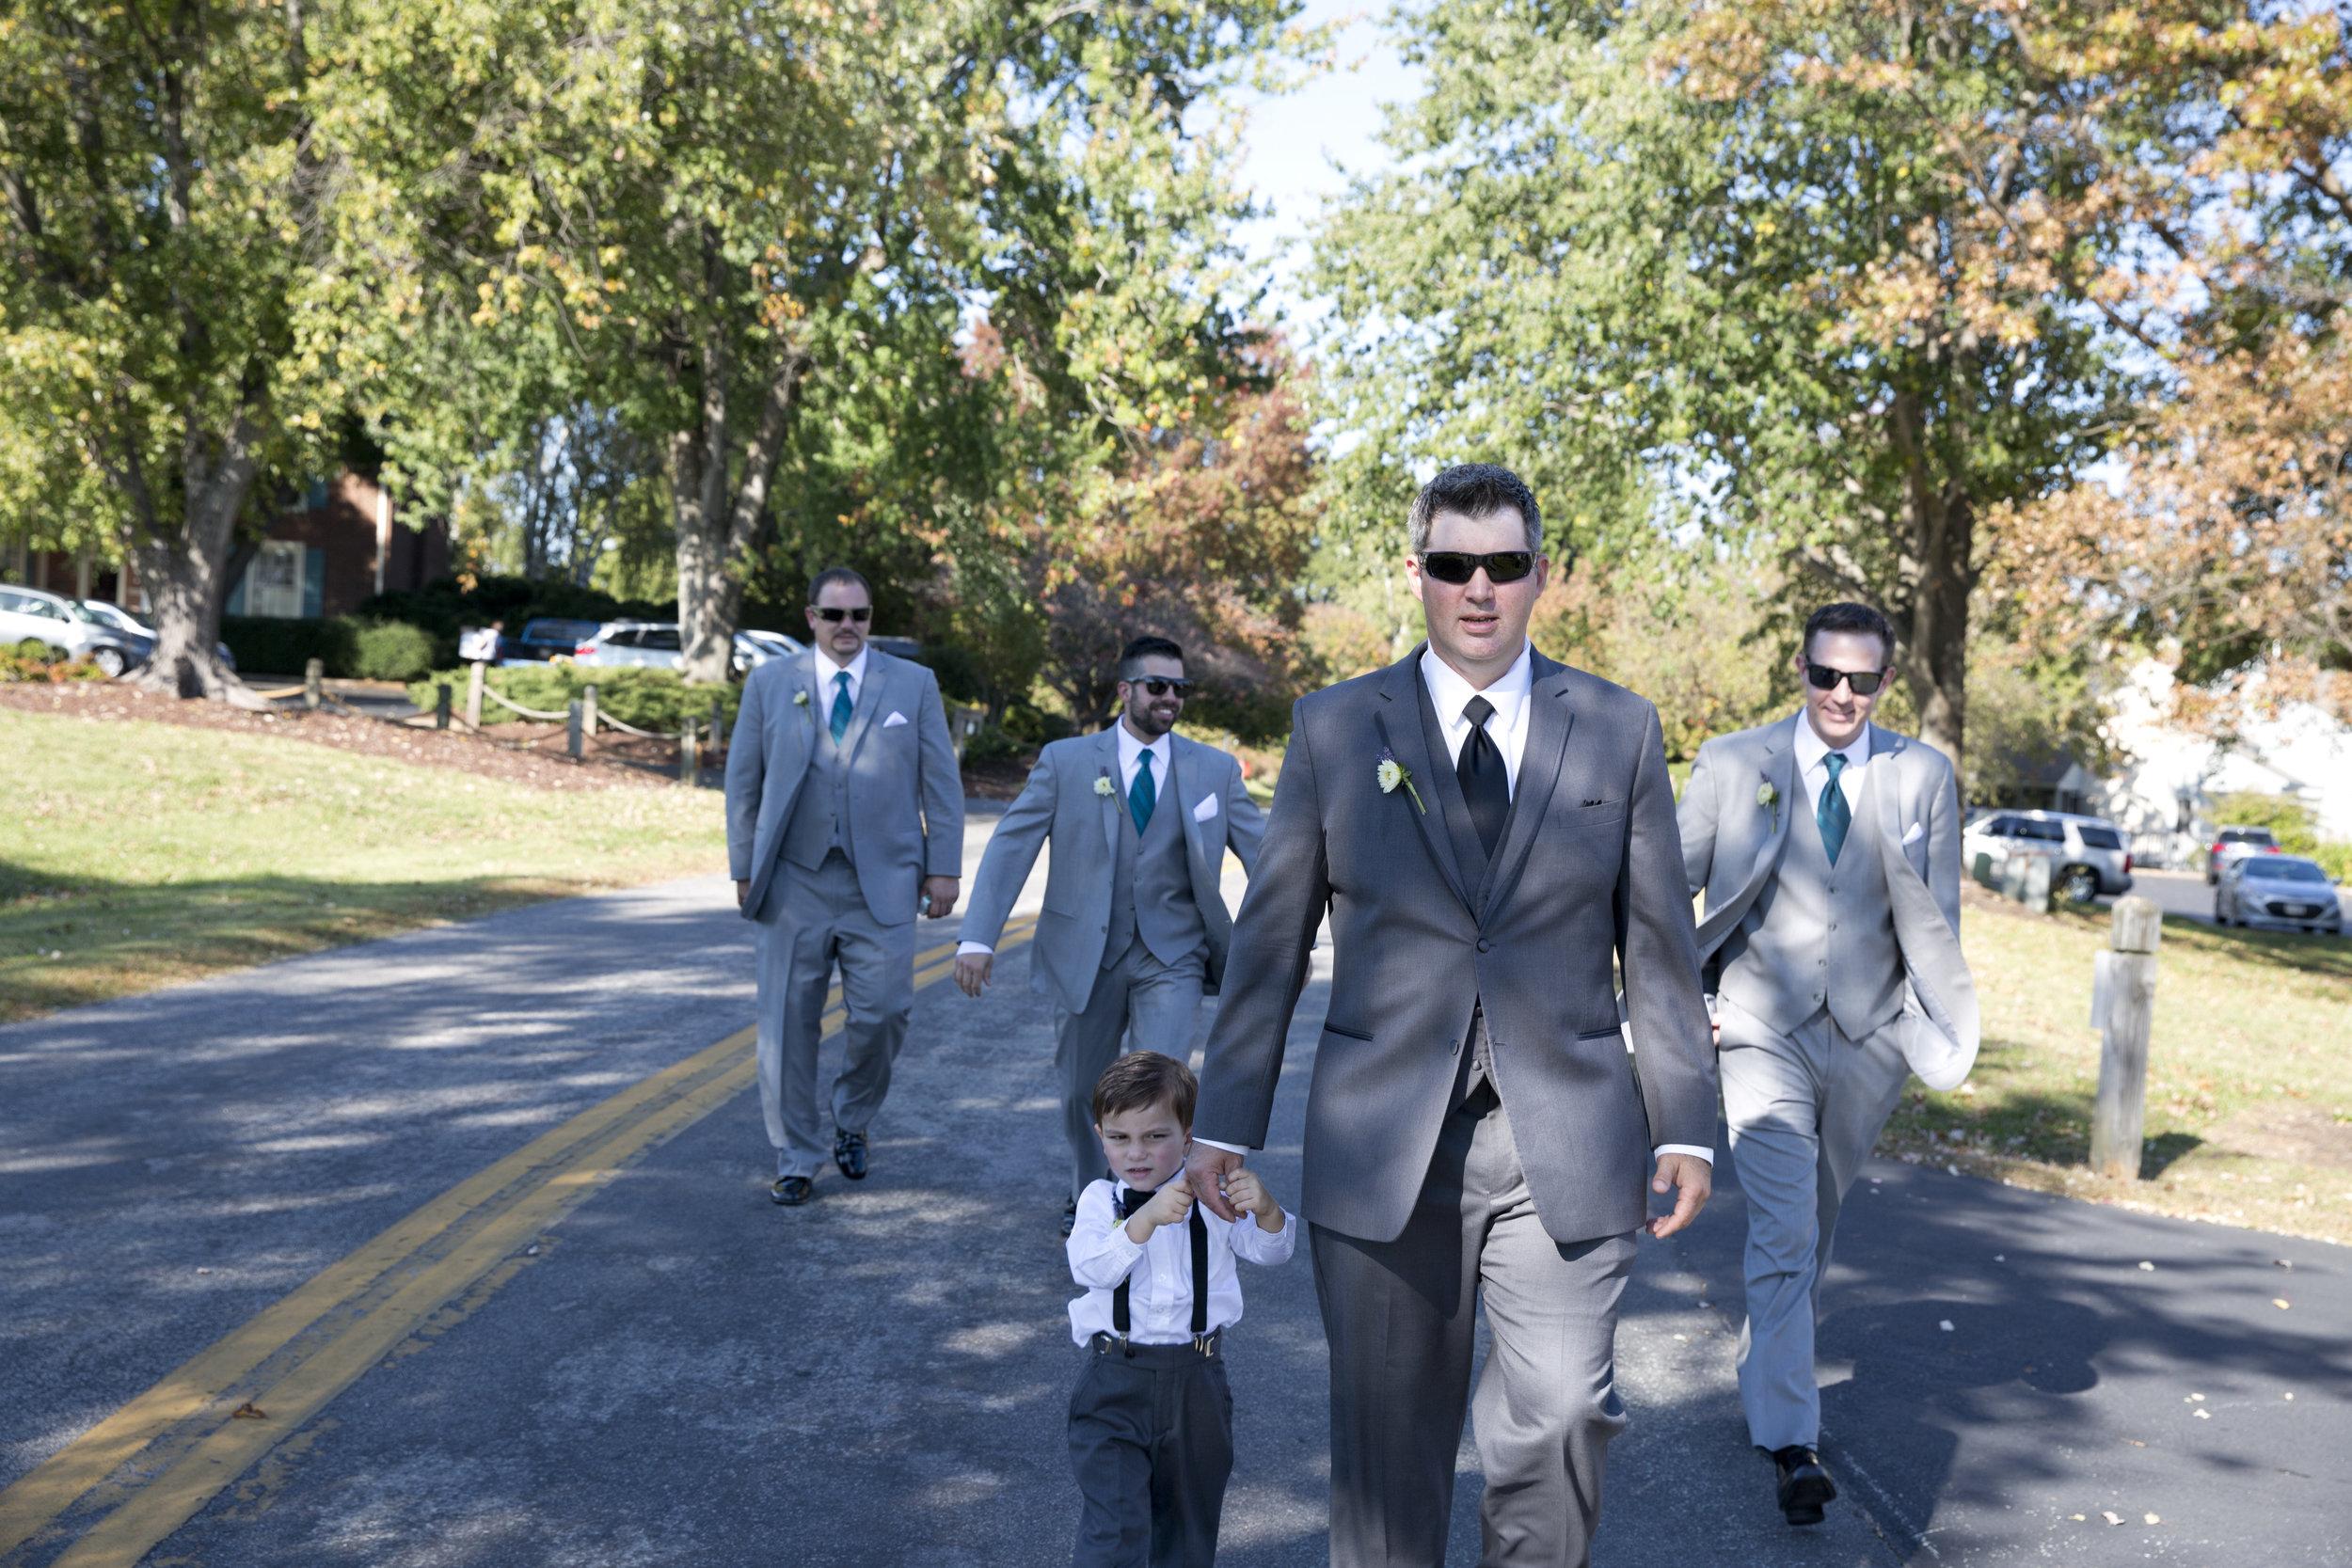 2016_Corin-Akin Wedding_1_PreCeremony_Final_F78A7401.jpg